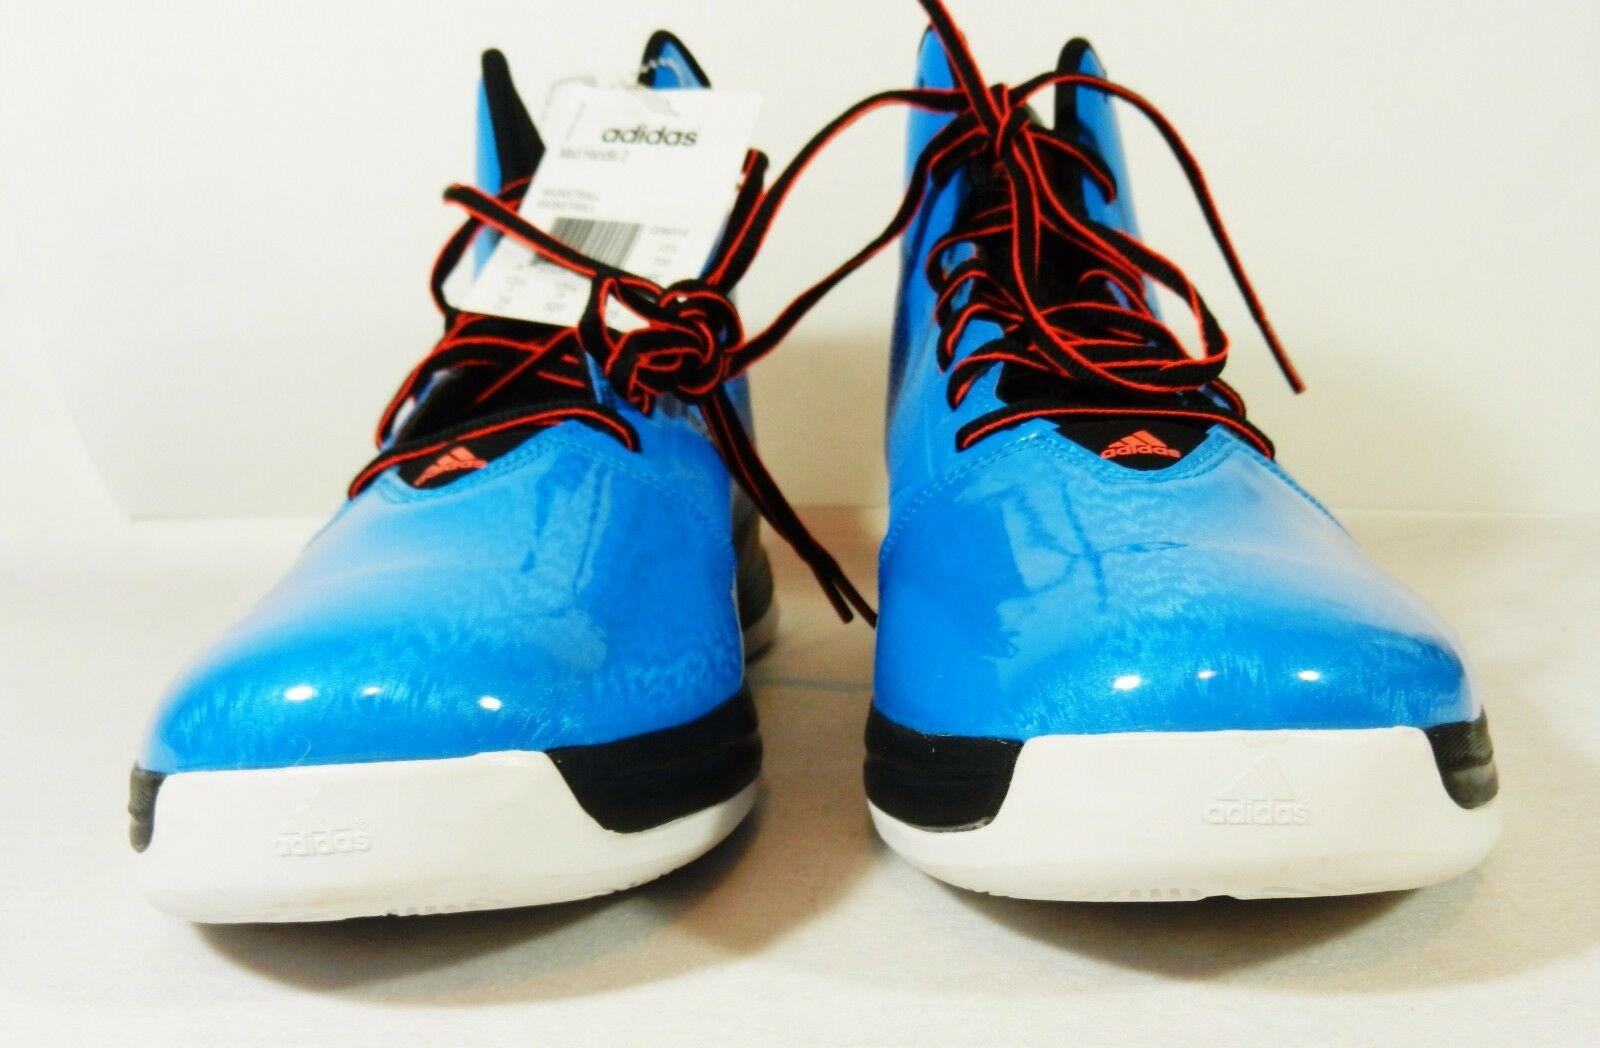 Adidas G98316 Blue Black Mad Handle 2 Mens Basketball Shoes ~ Sz 14 ~ NWOB Seasonal price cuts, discount benefits